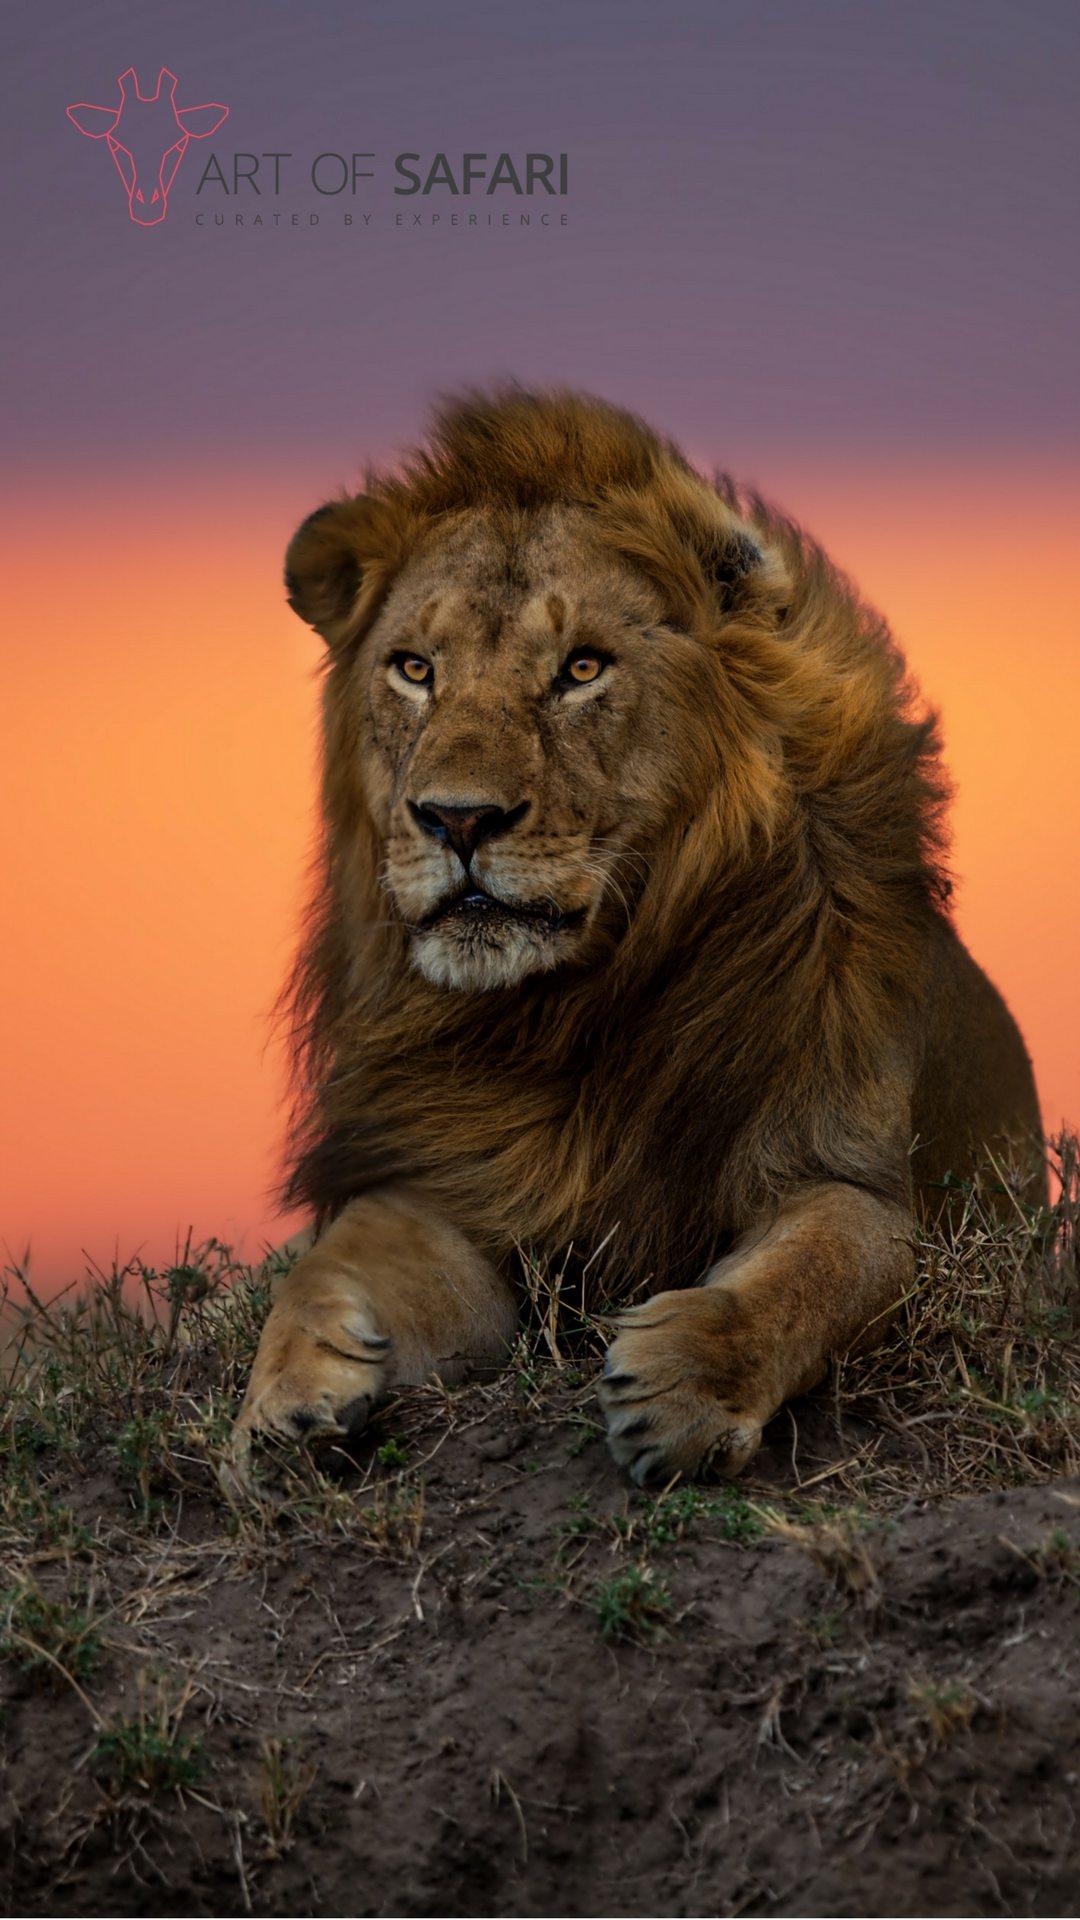 Wallpaper | A Lion At Sunset | Art Of Safari